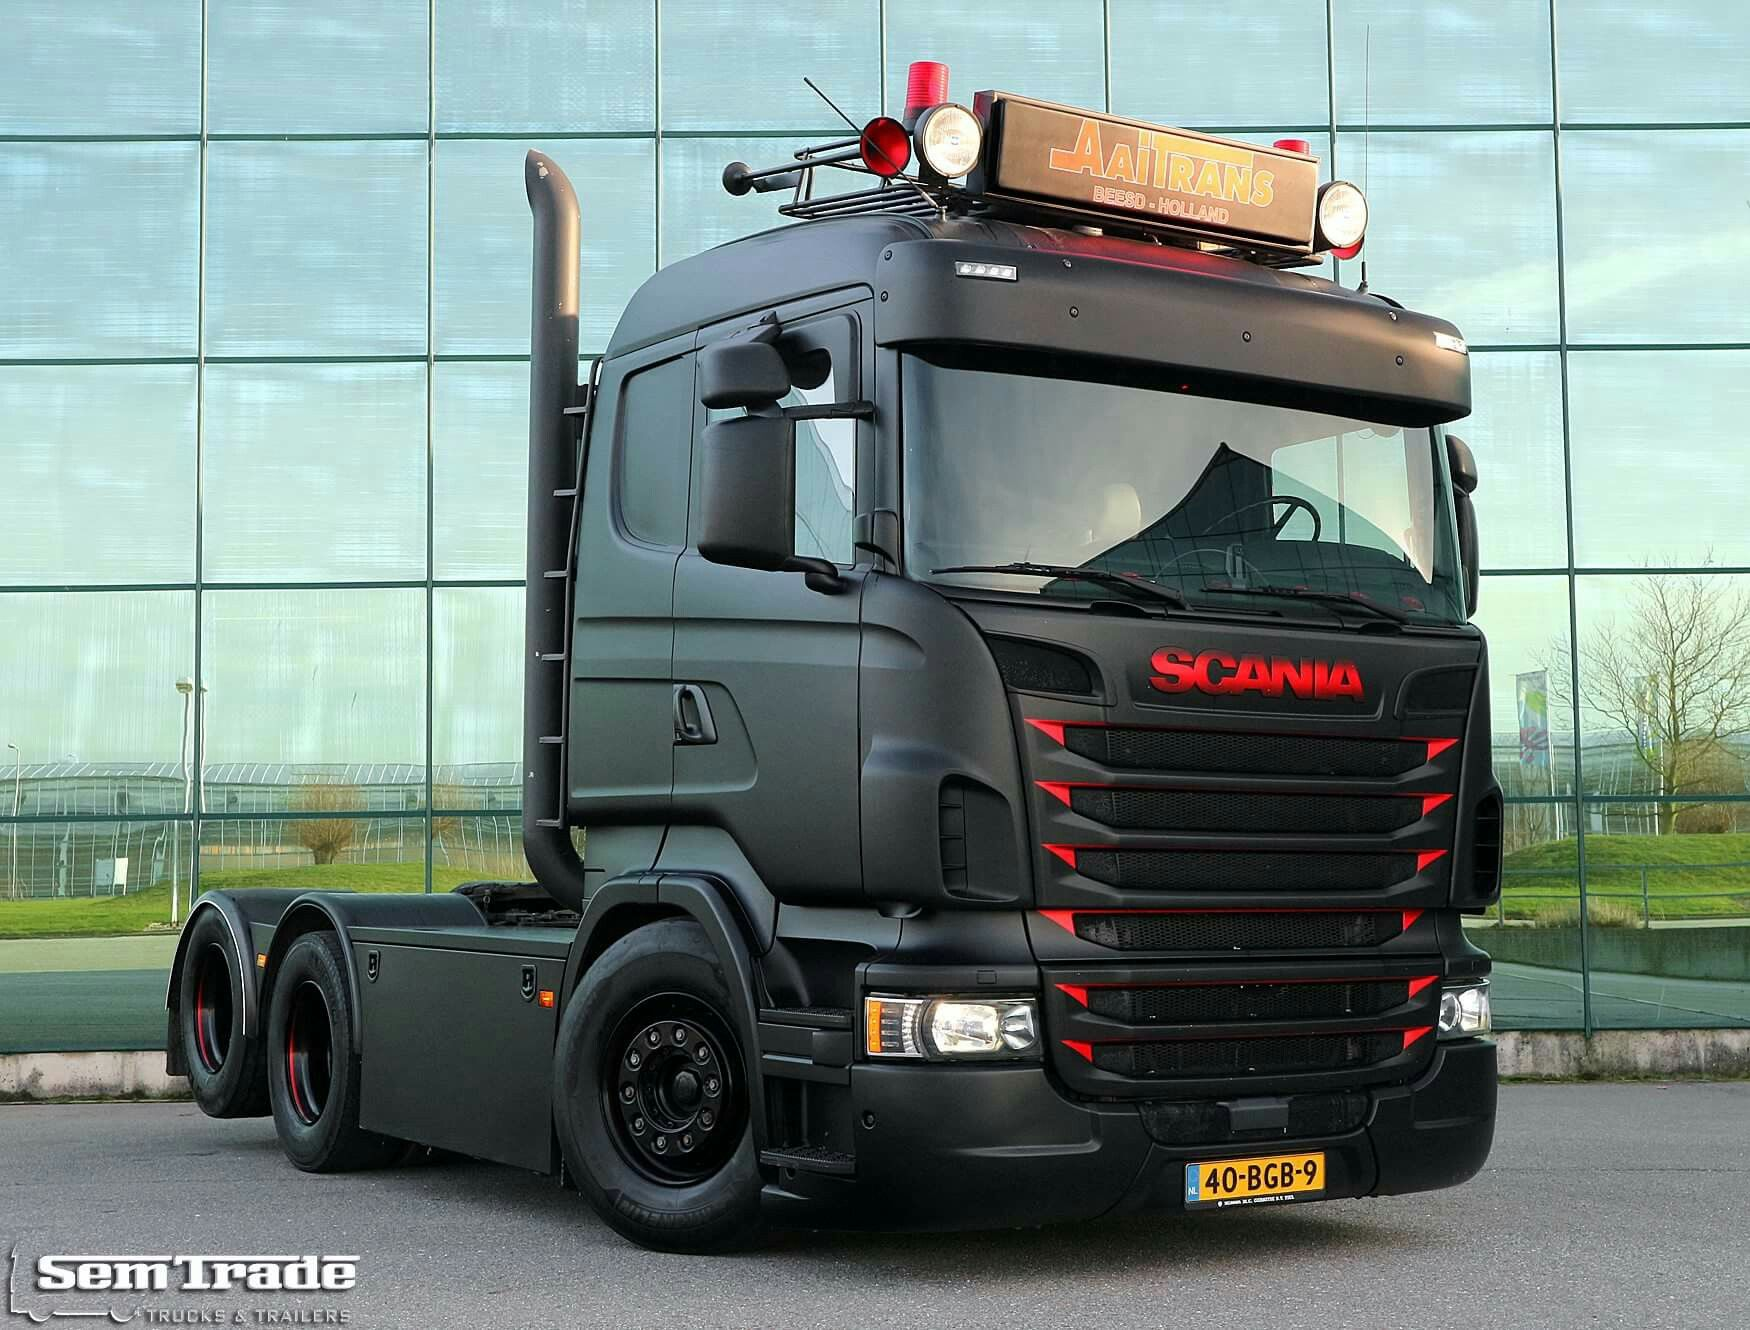 Longline Scania For Sale Scania S730t Van Vlastuin Onthuld